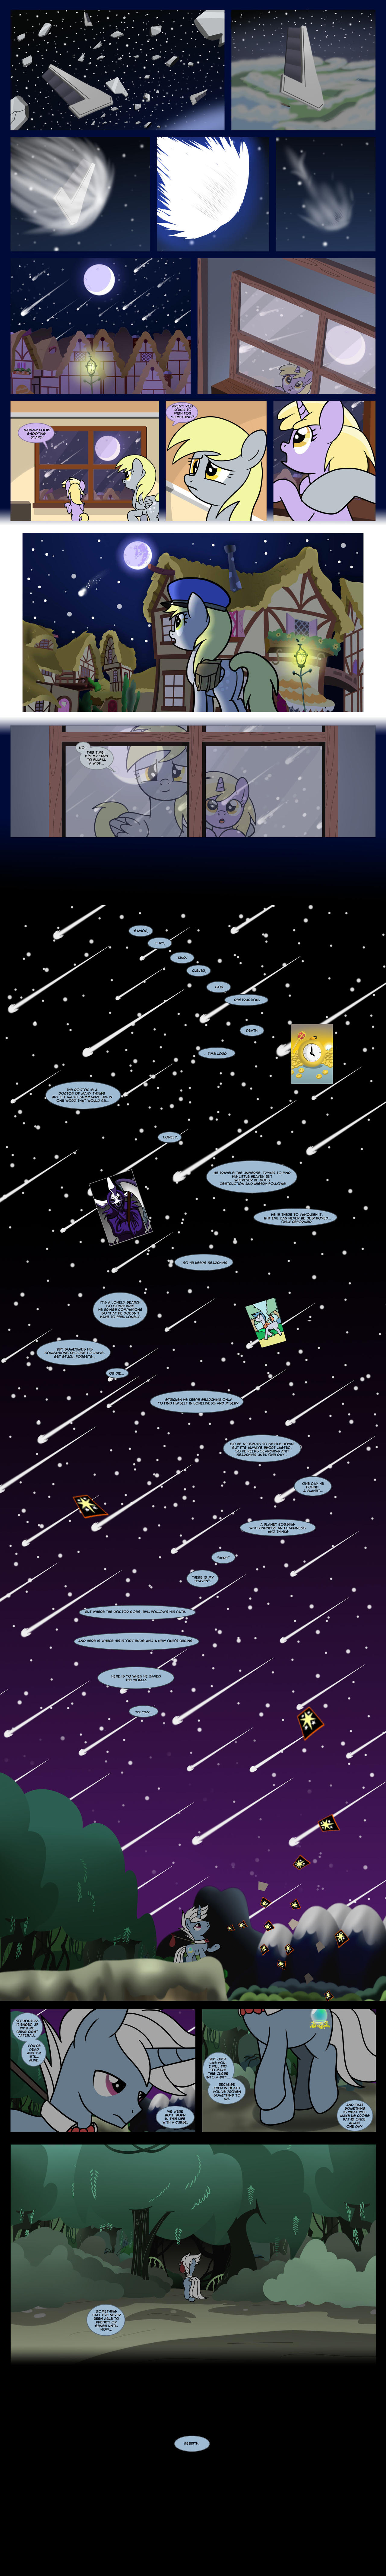 Doctor Whooves - Rebirth End by Edowaado